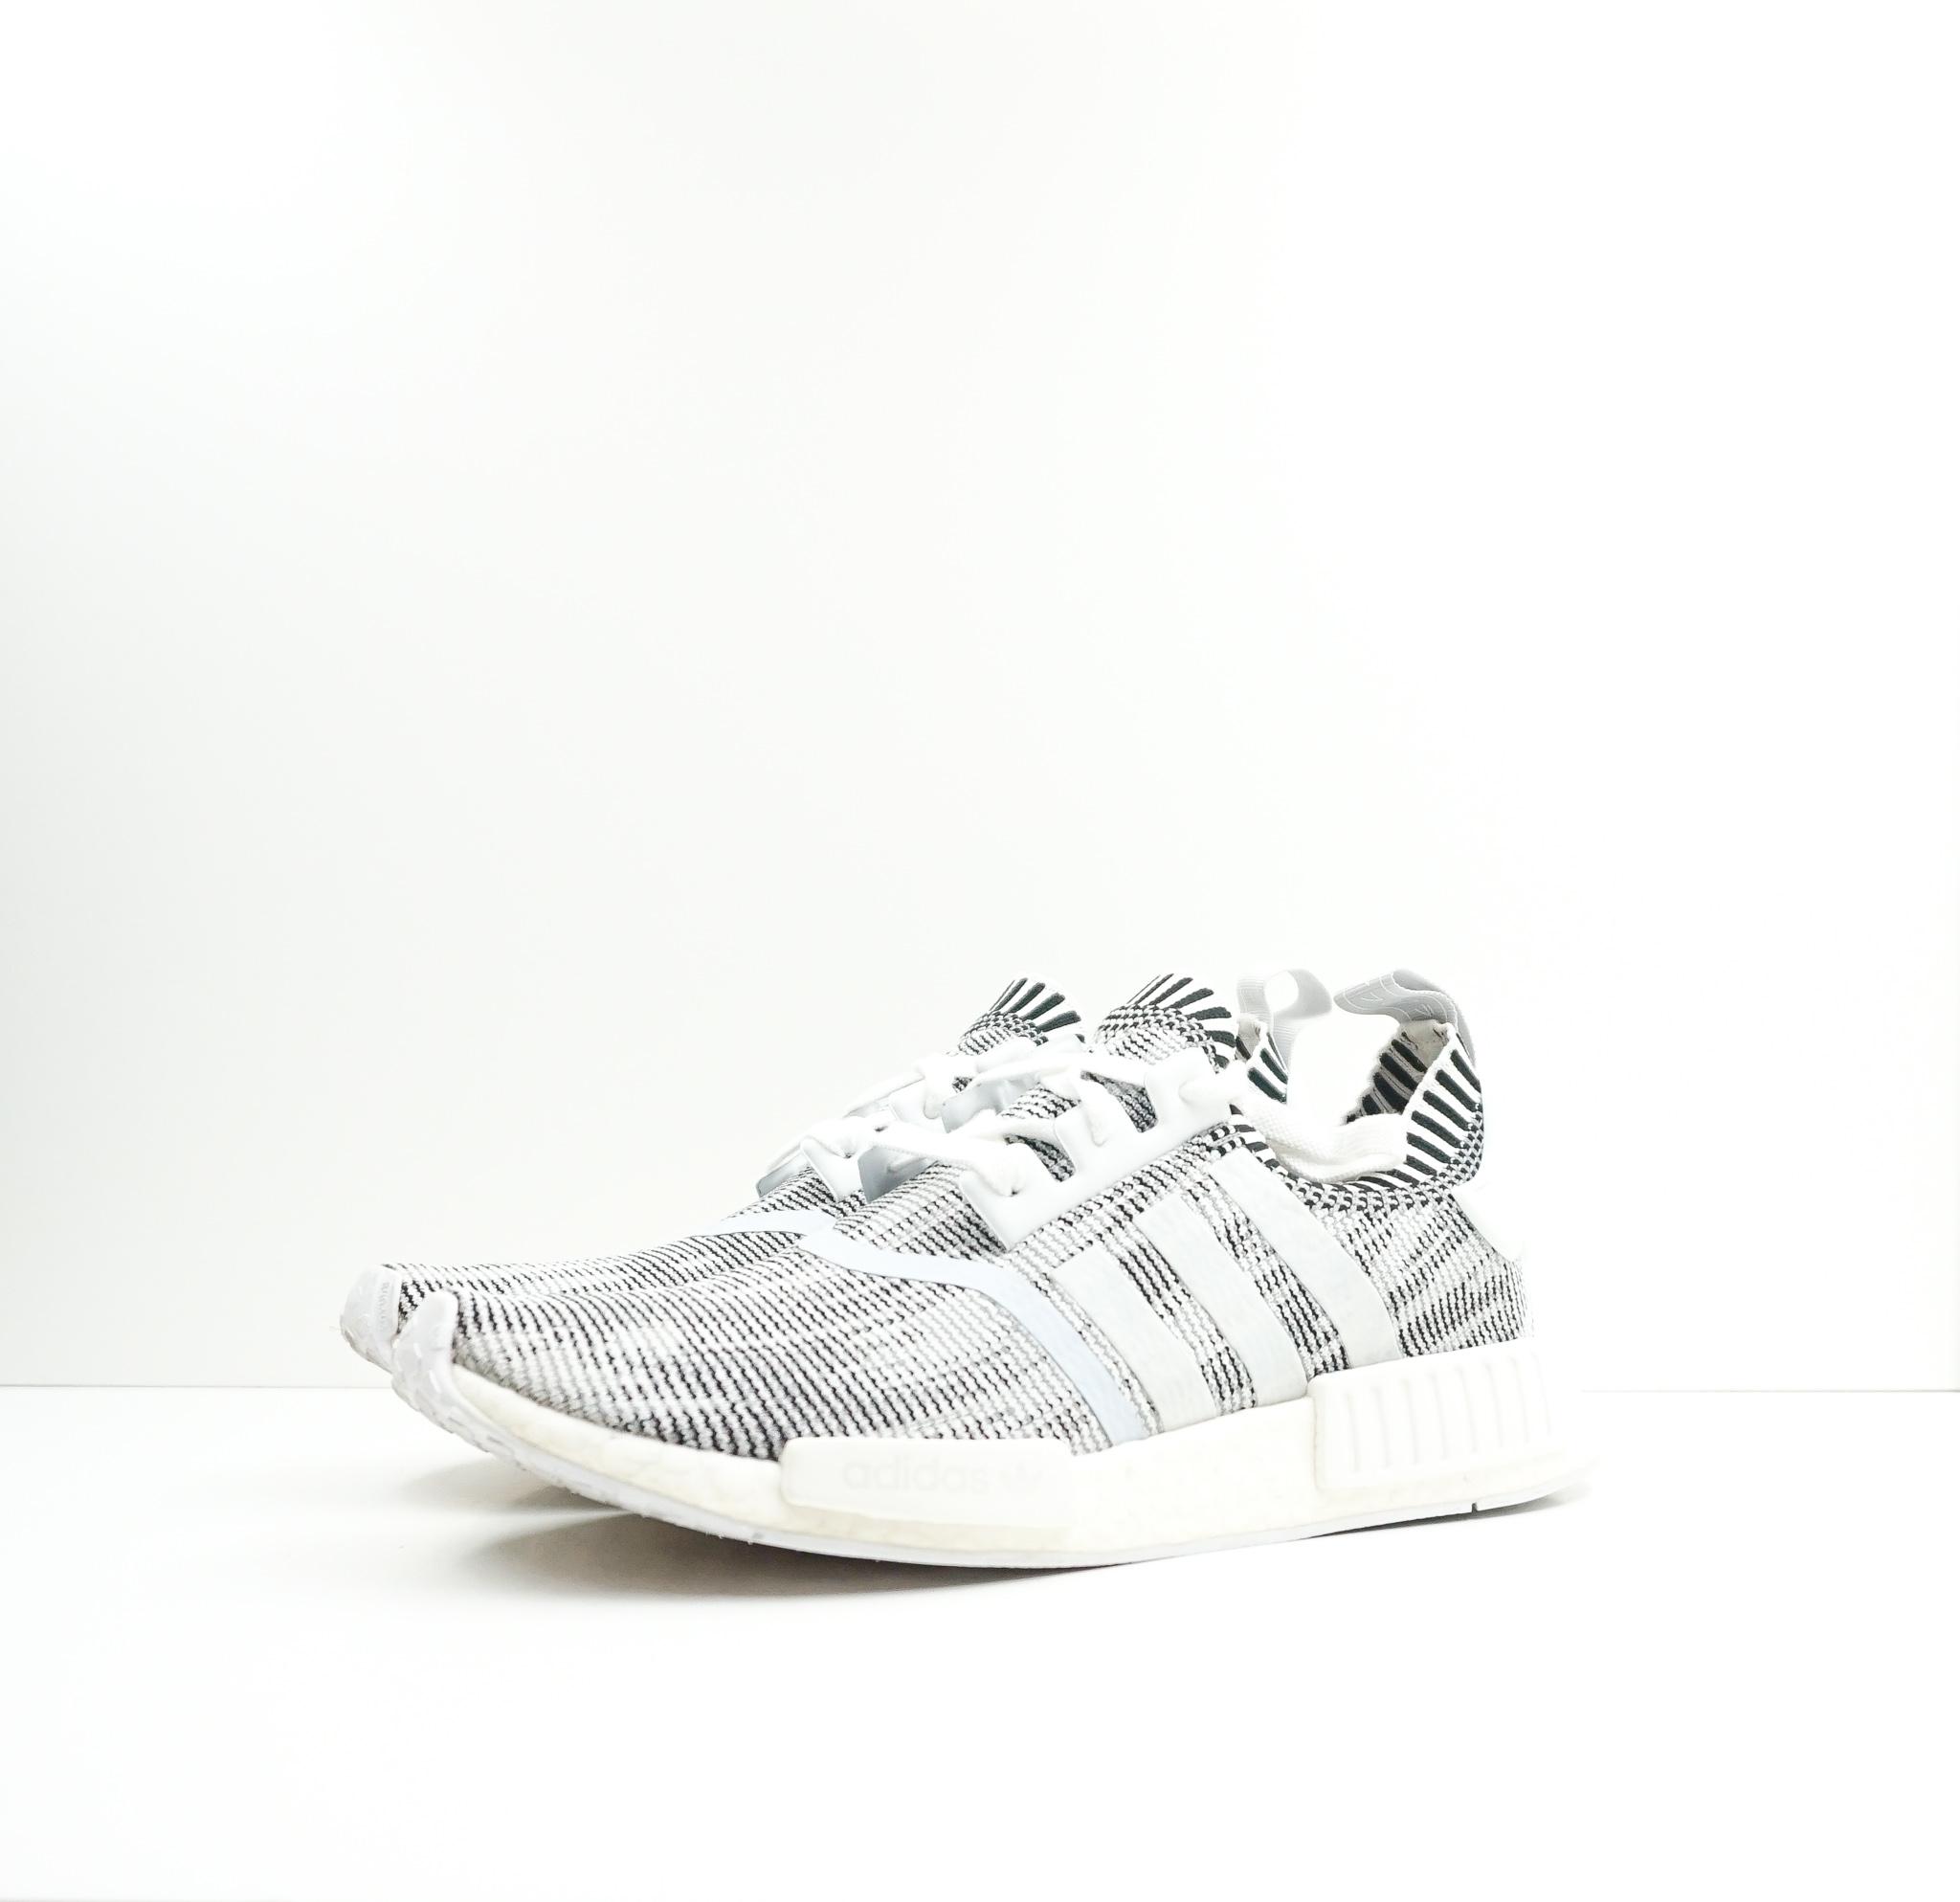 Adidas NMD R1 Glitch Camo White Black